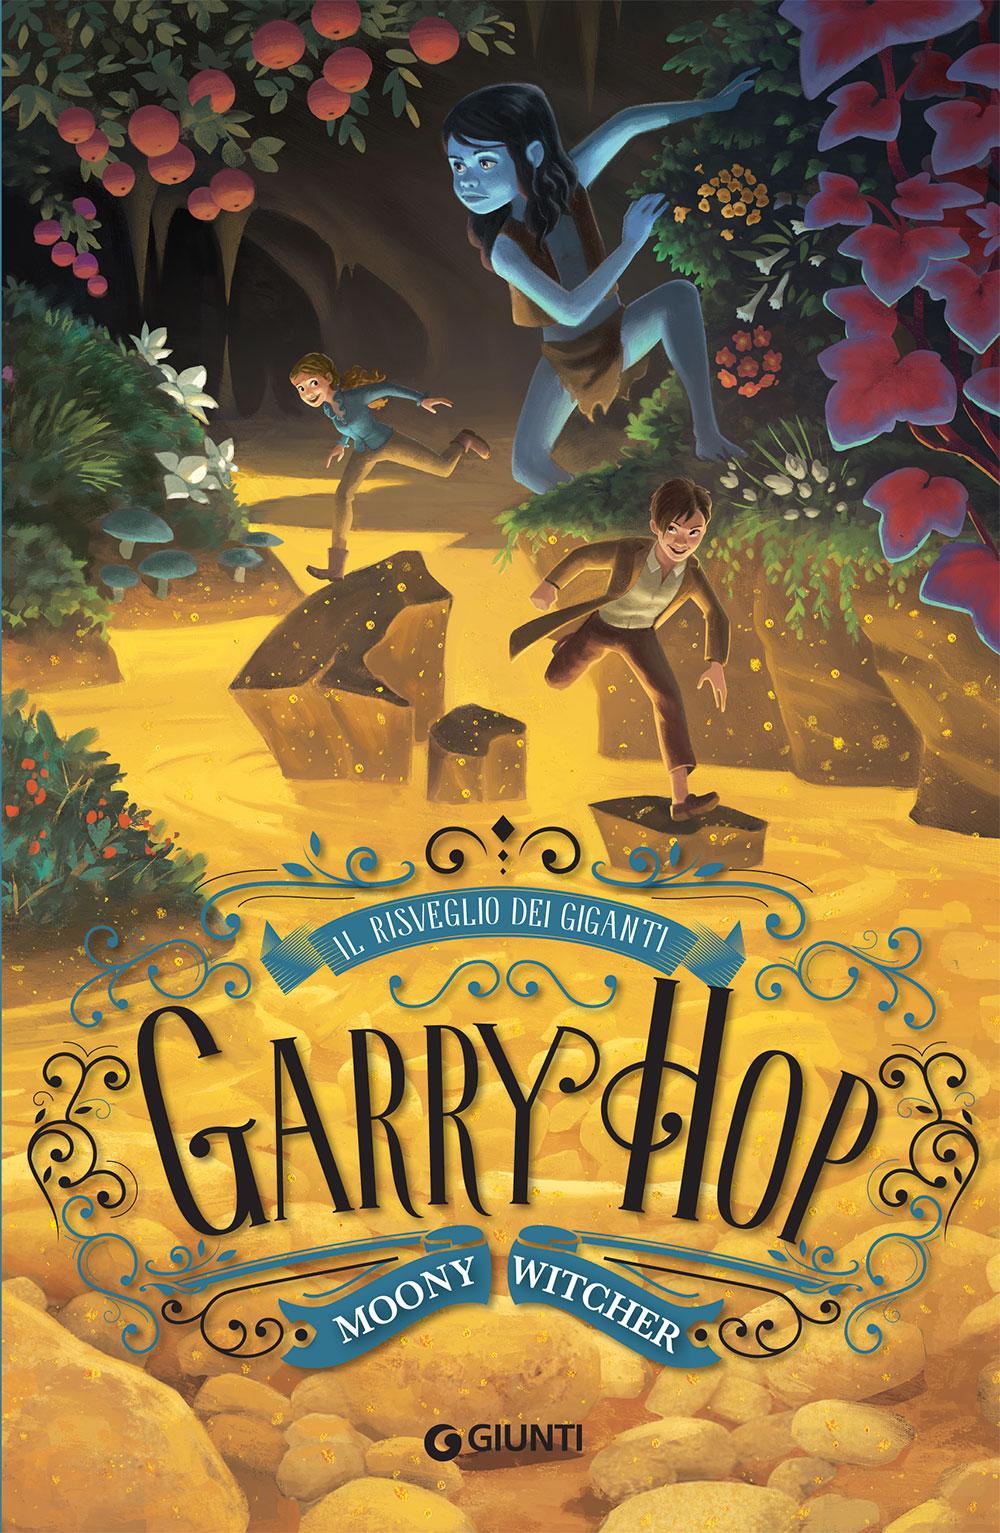 Garry Hop. Il risveglio dei giganti (Garry Hop. The awakening of the giants)